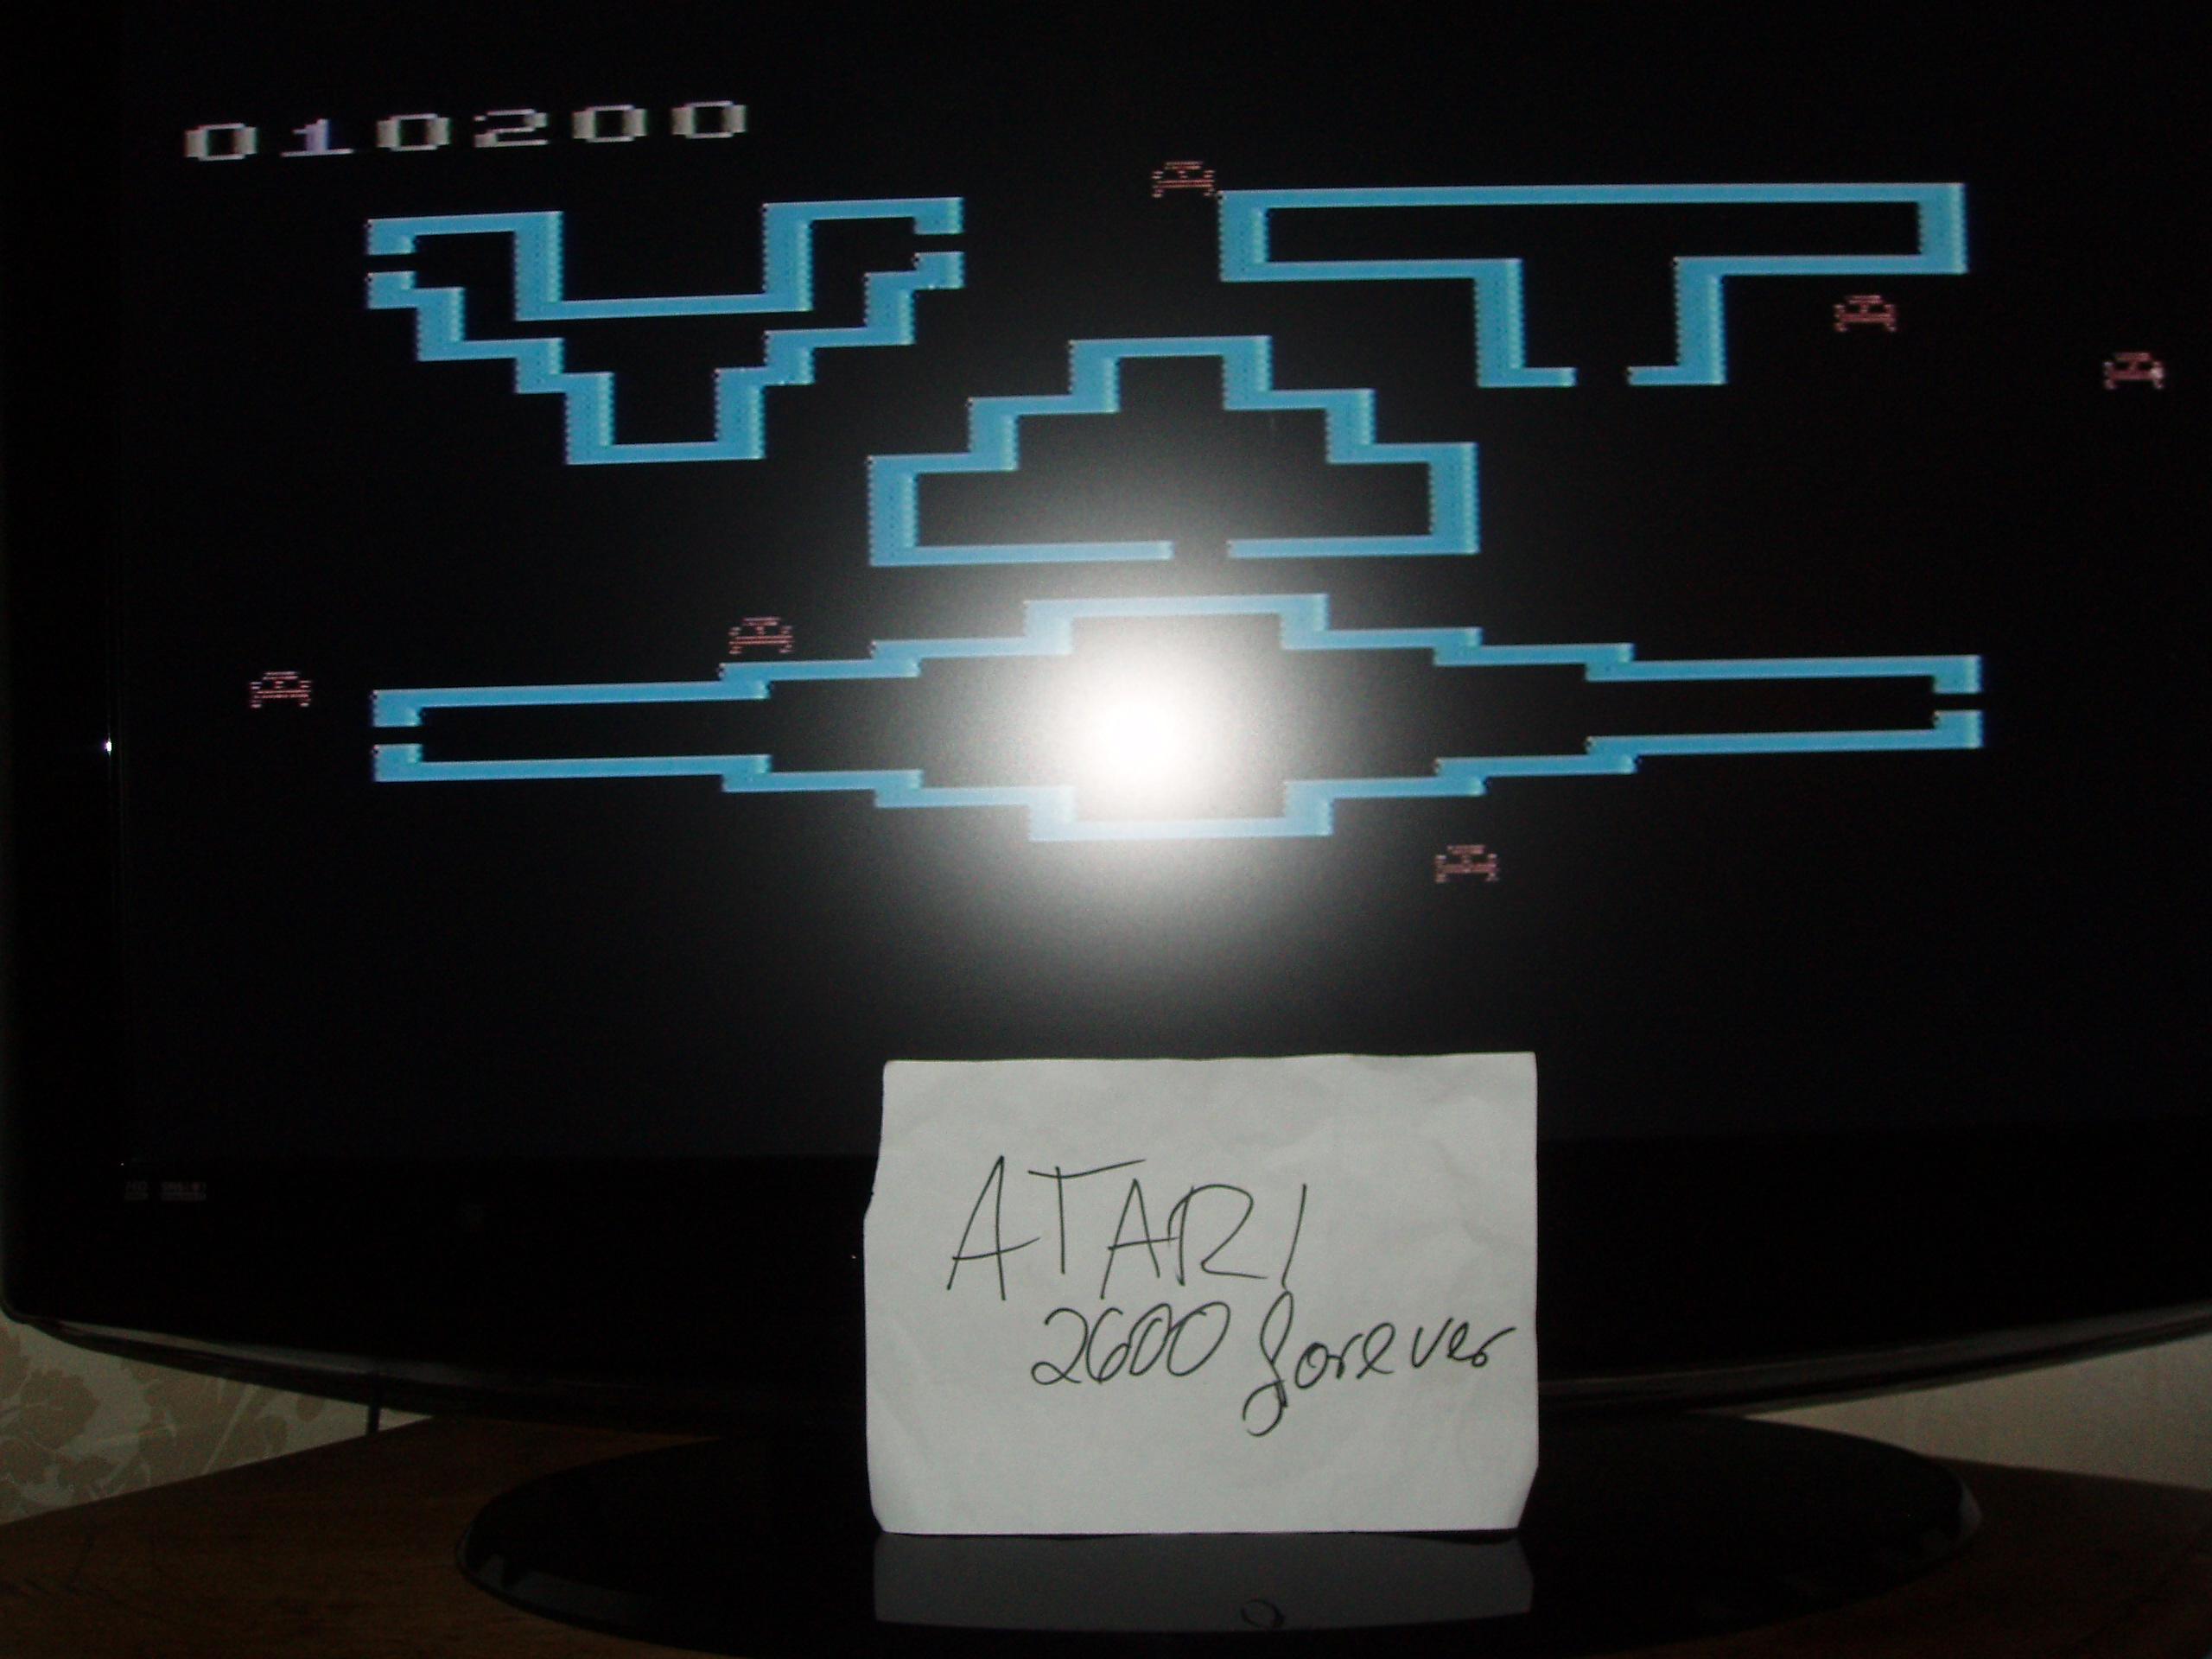 atari2600forever: Venture (Atari 2600 Novice/B) 10,200 points on 2019-01-10 03:21:35